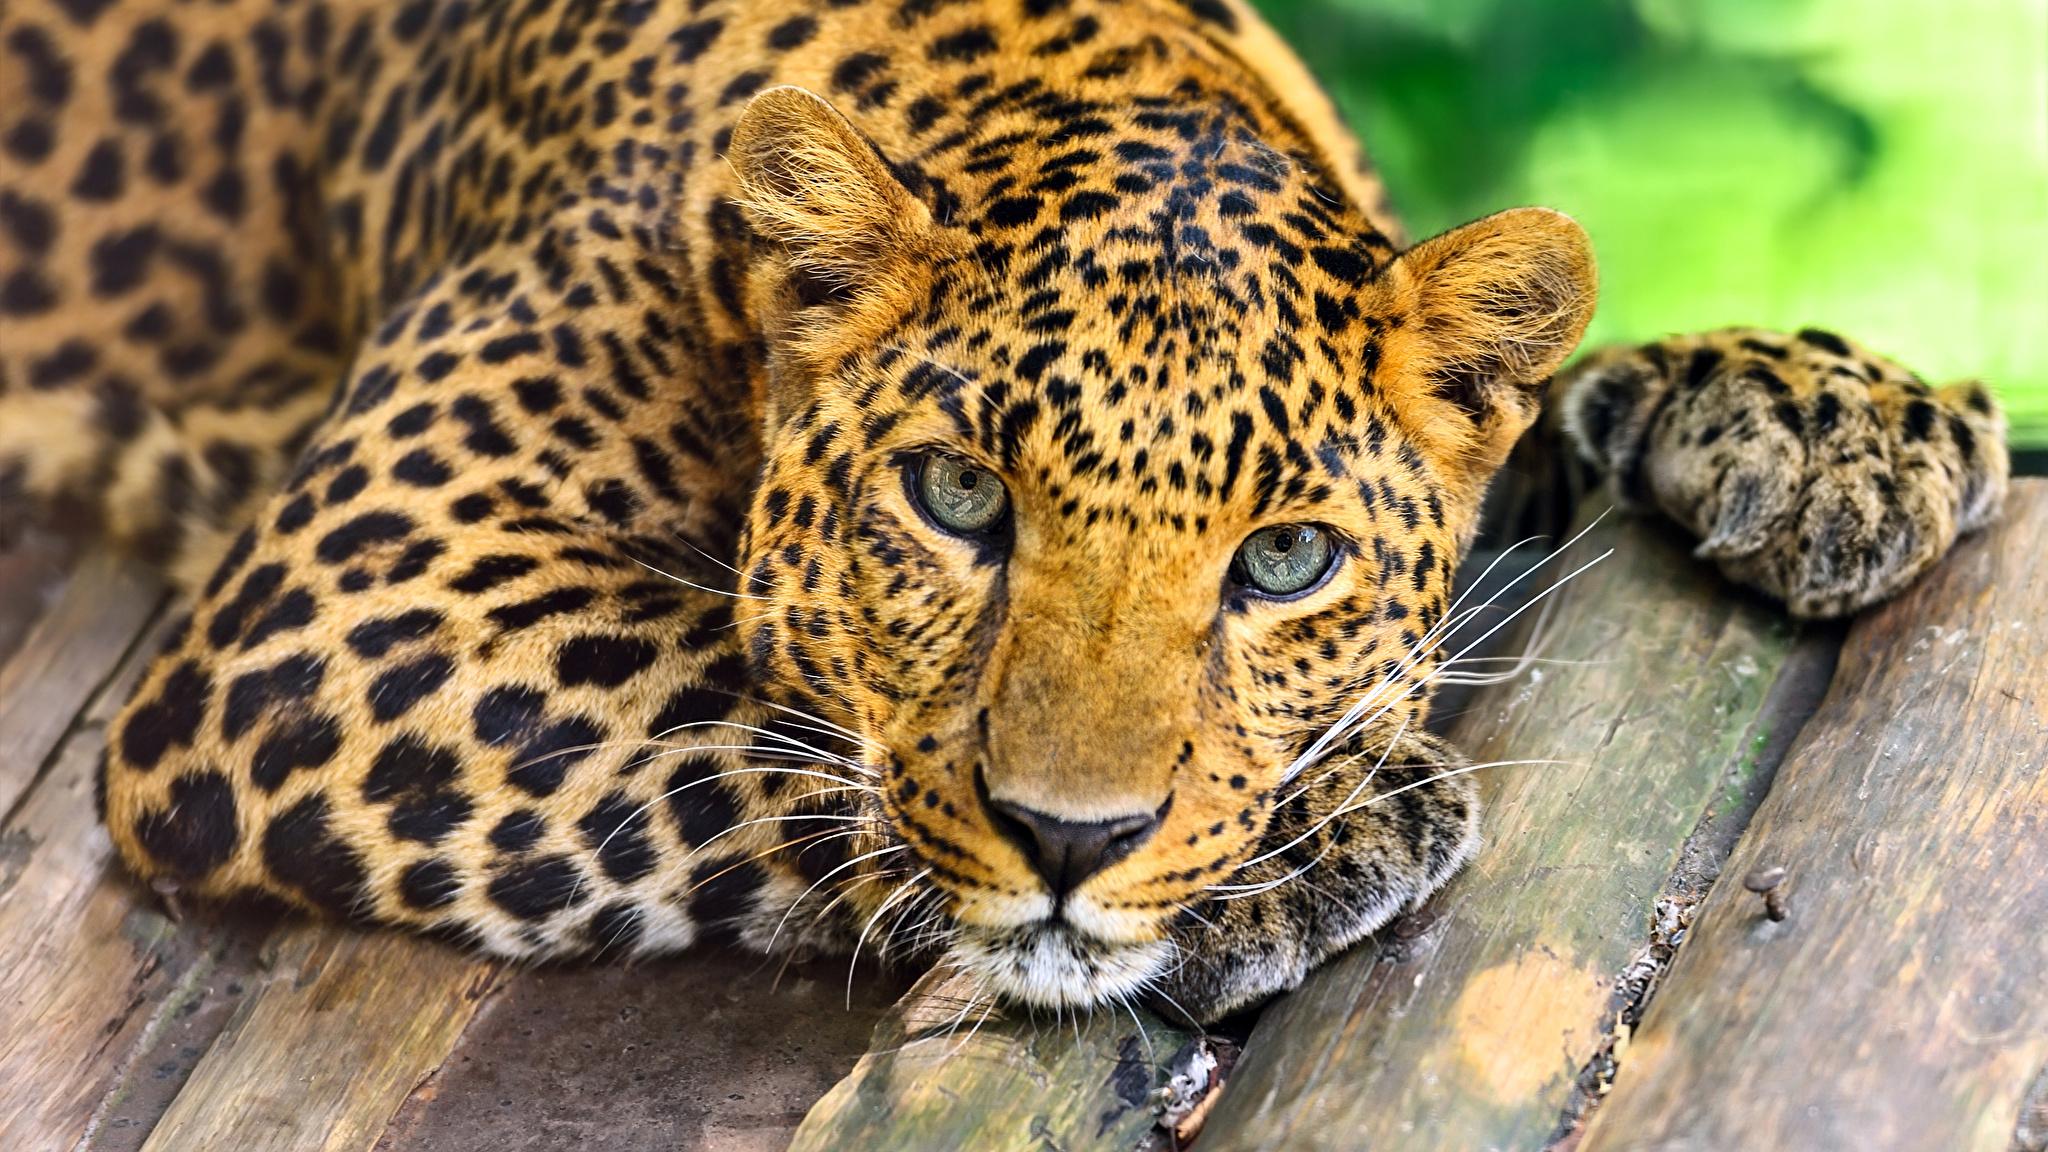 Big_cats_Leopards_Wood_planks_Glance_512